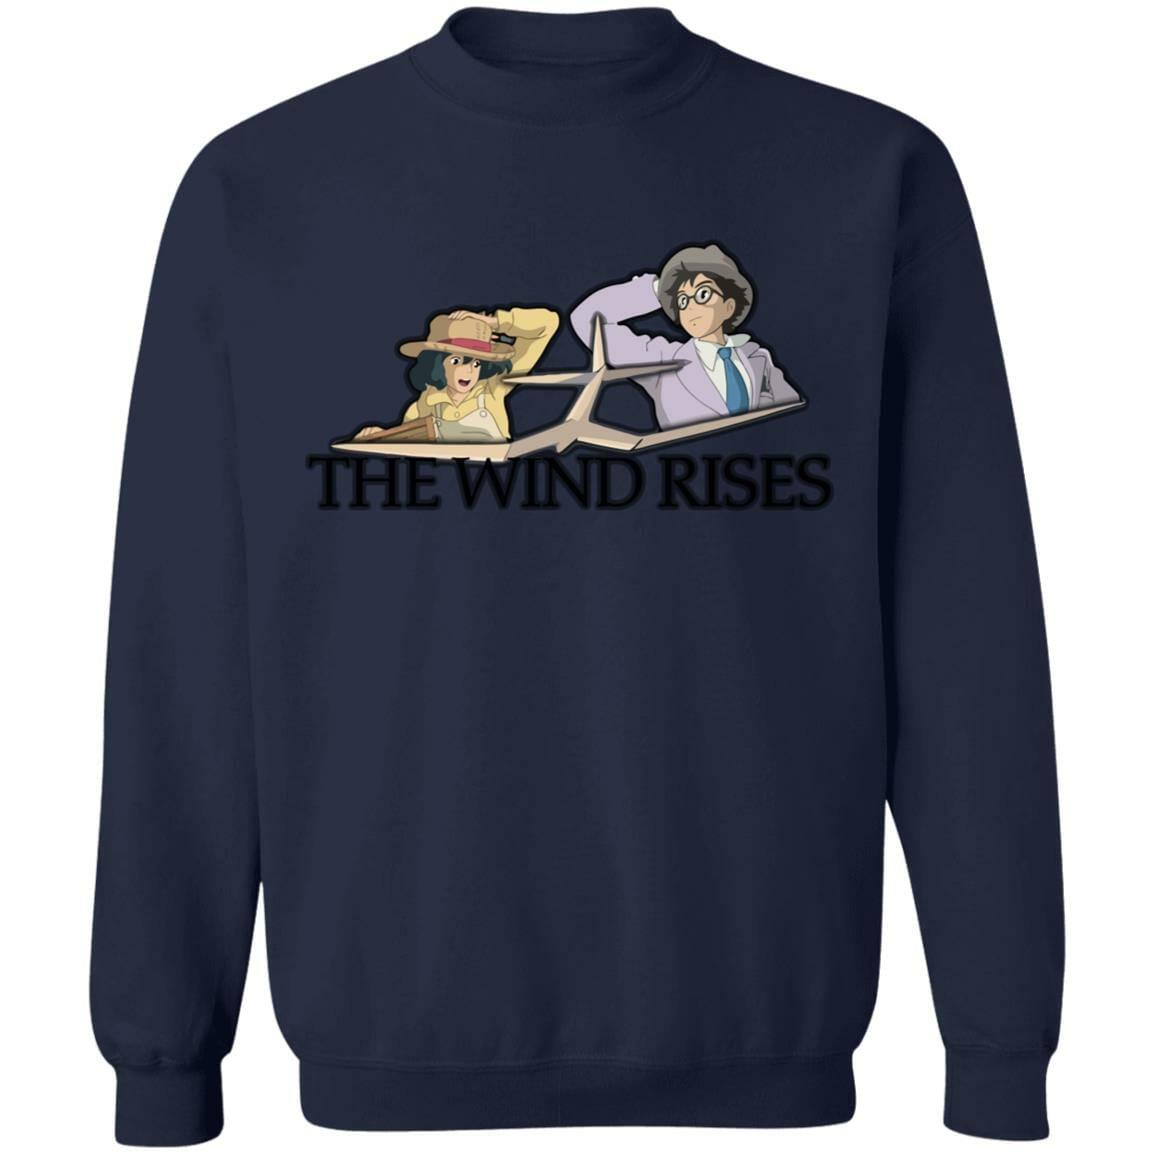 The Wind Rises – Airplane Sweatshirt